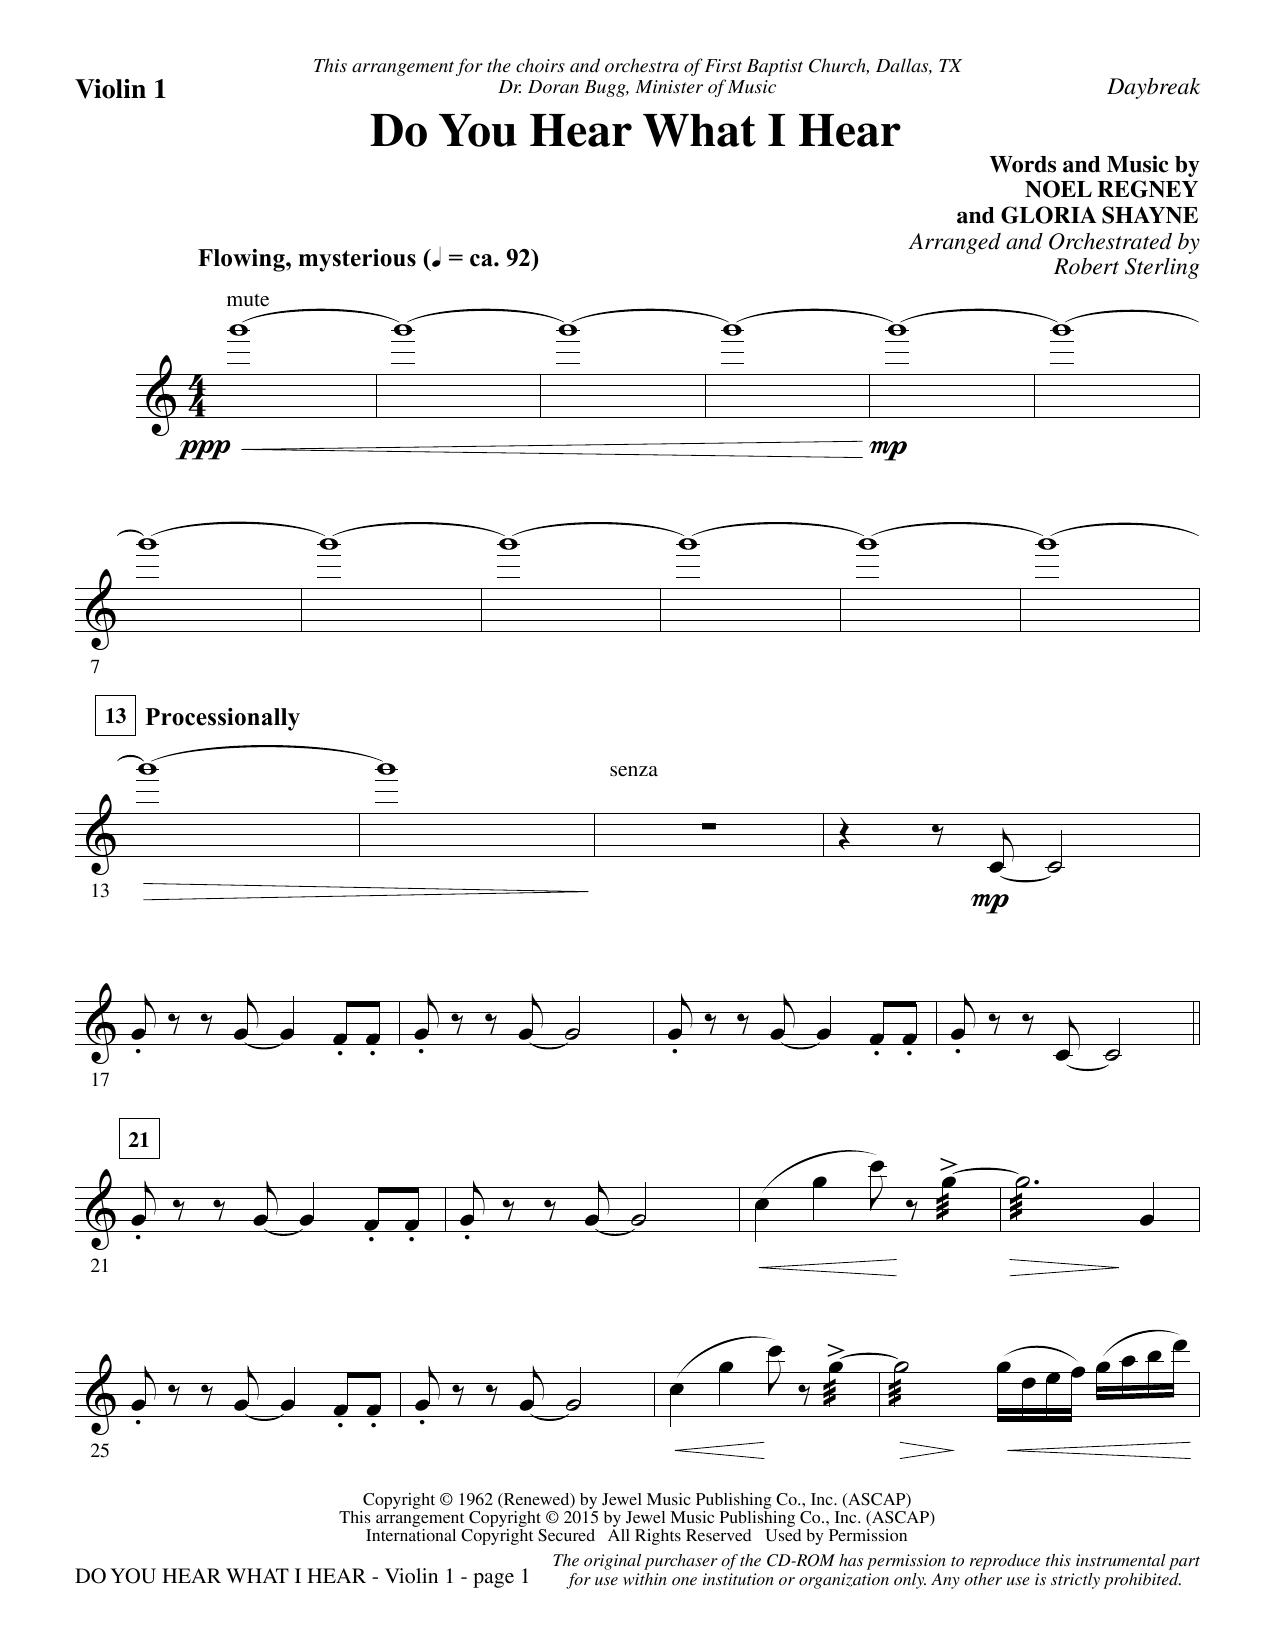 Do You Hear What I Hear - Violin 1 Sheet Music